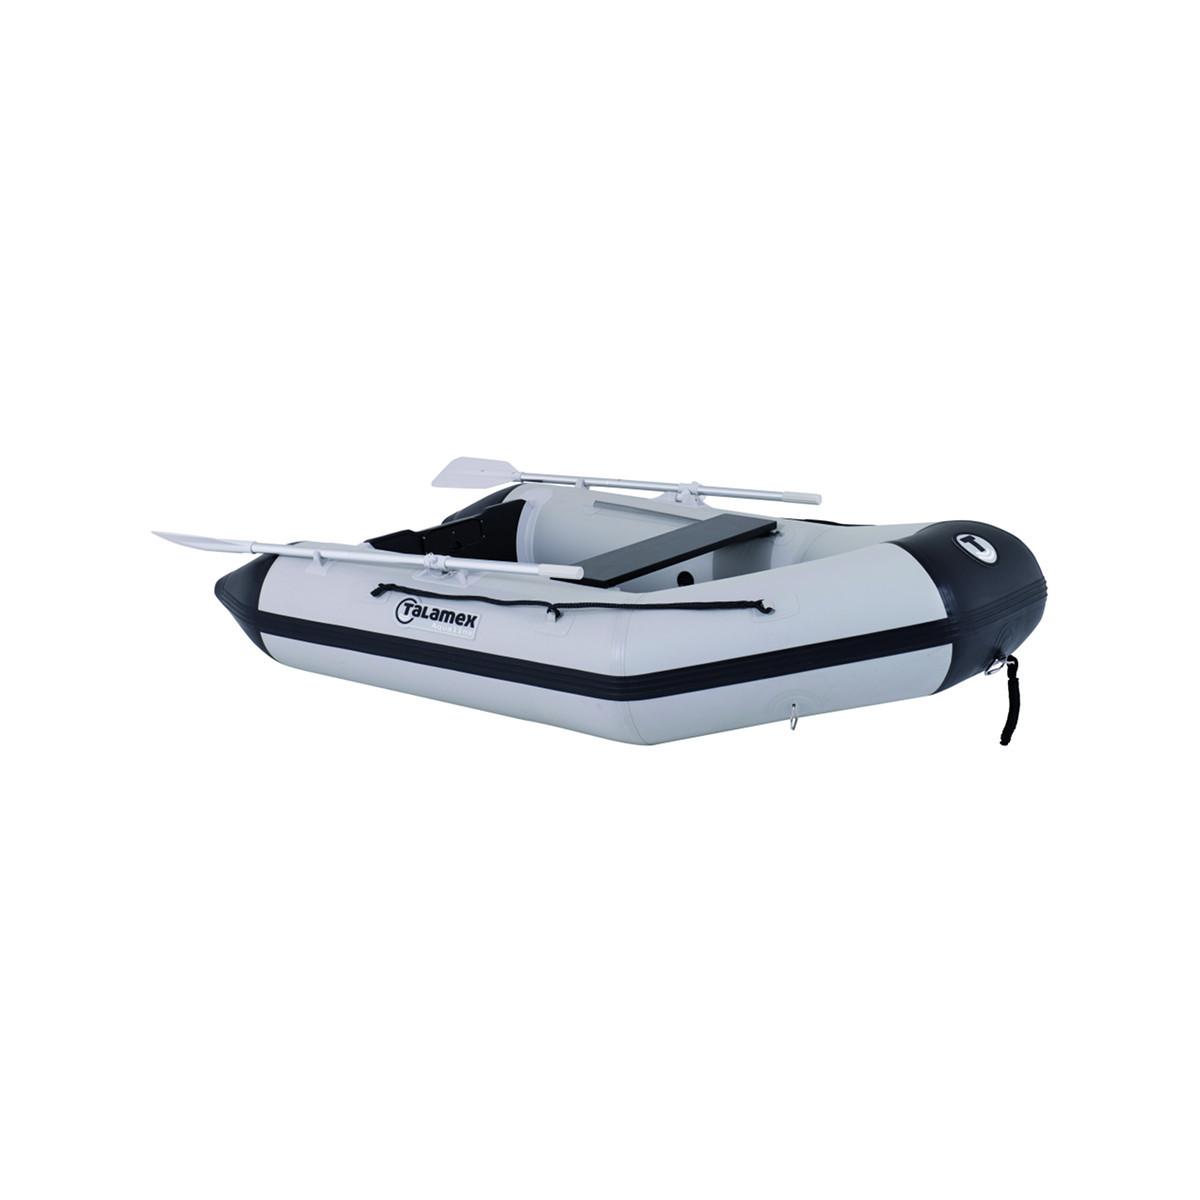 Talamex Aqualine QLA300 opblaasbare rubberboot met opblaasbare bodem, lengte 3,00m, grijs